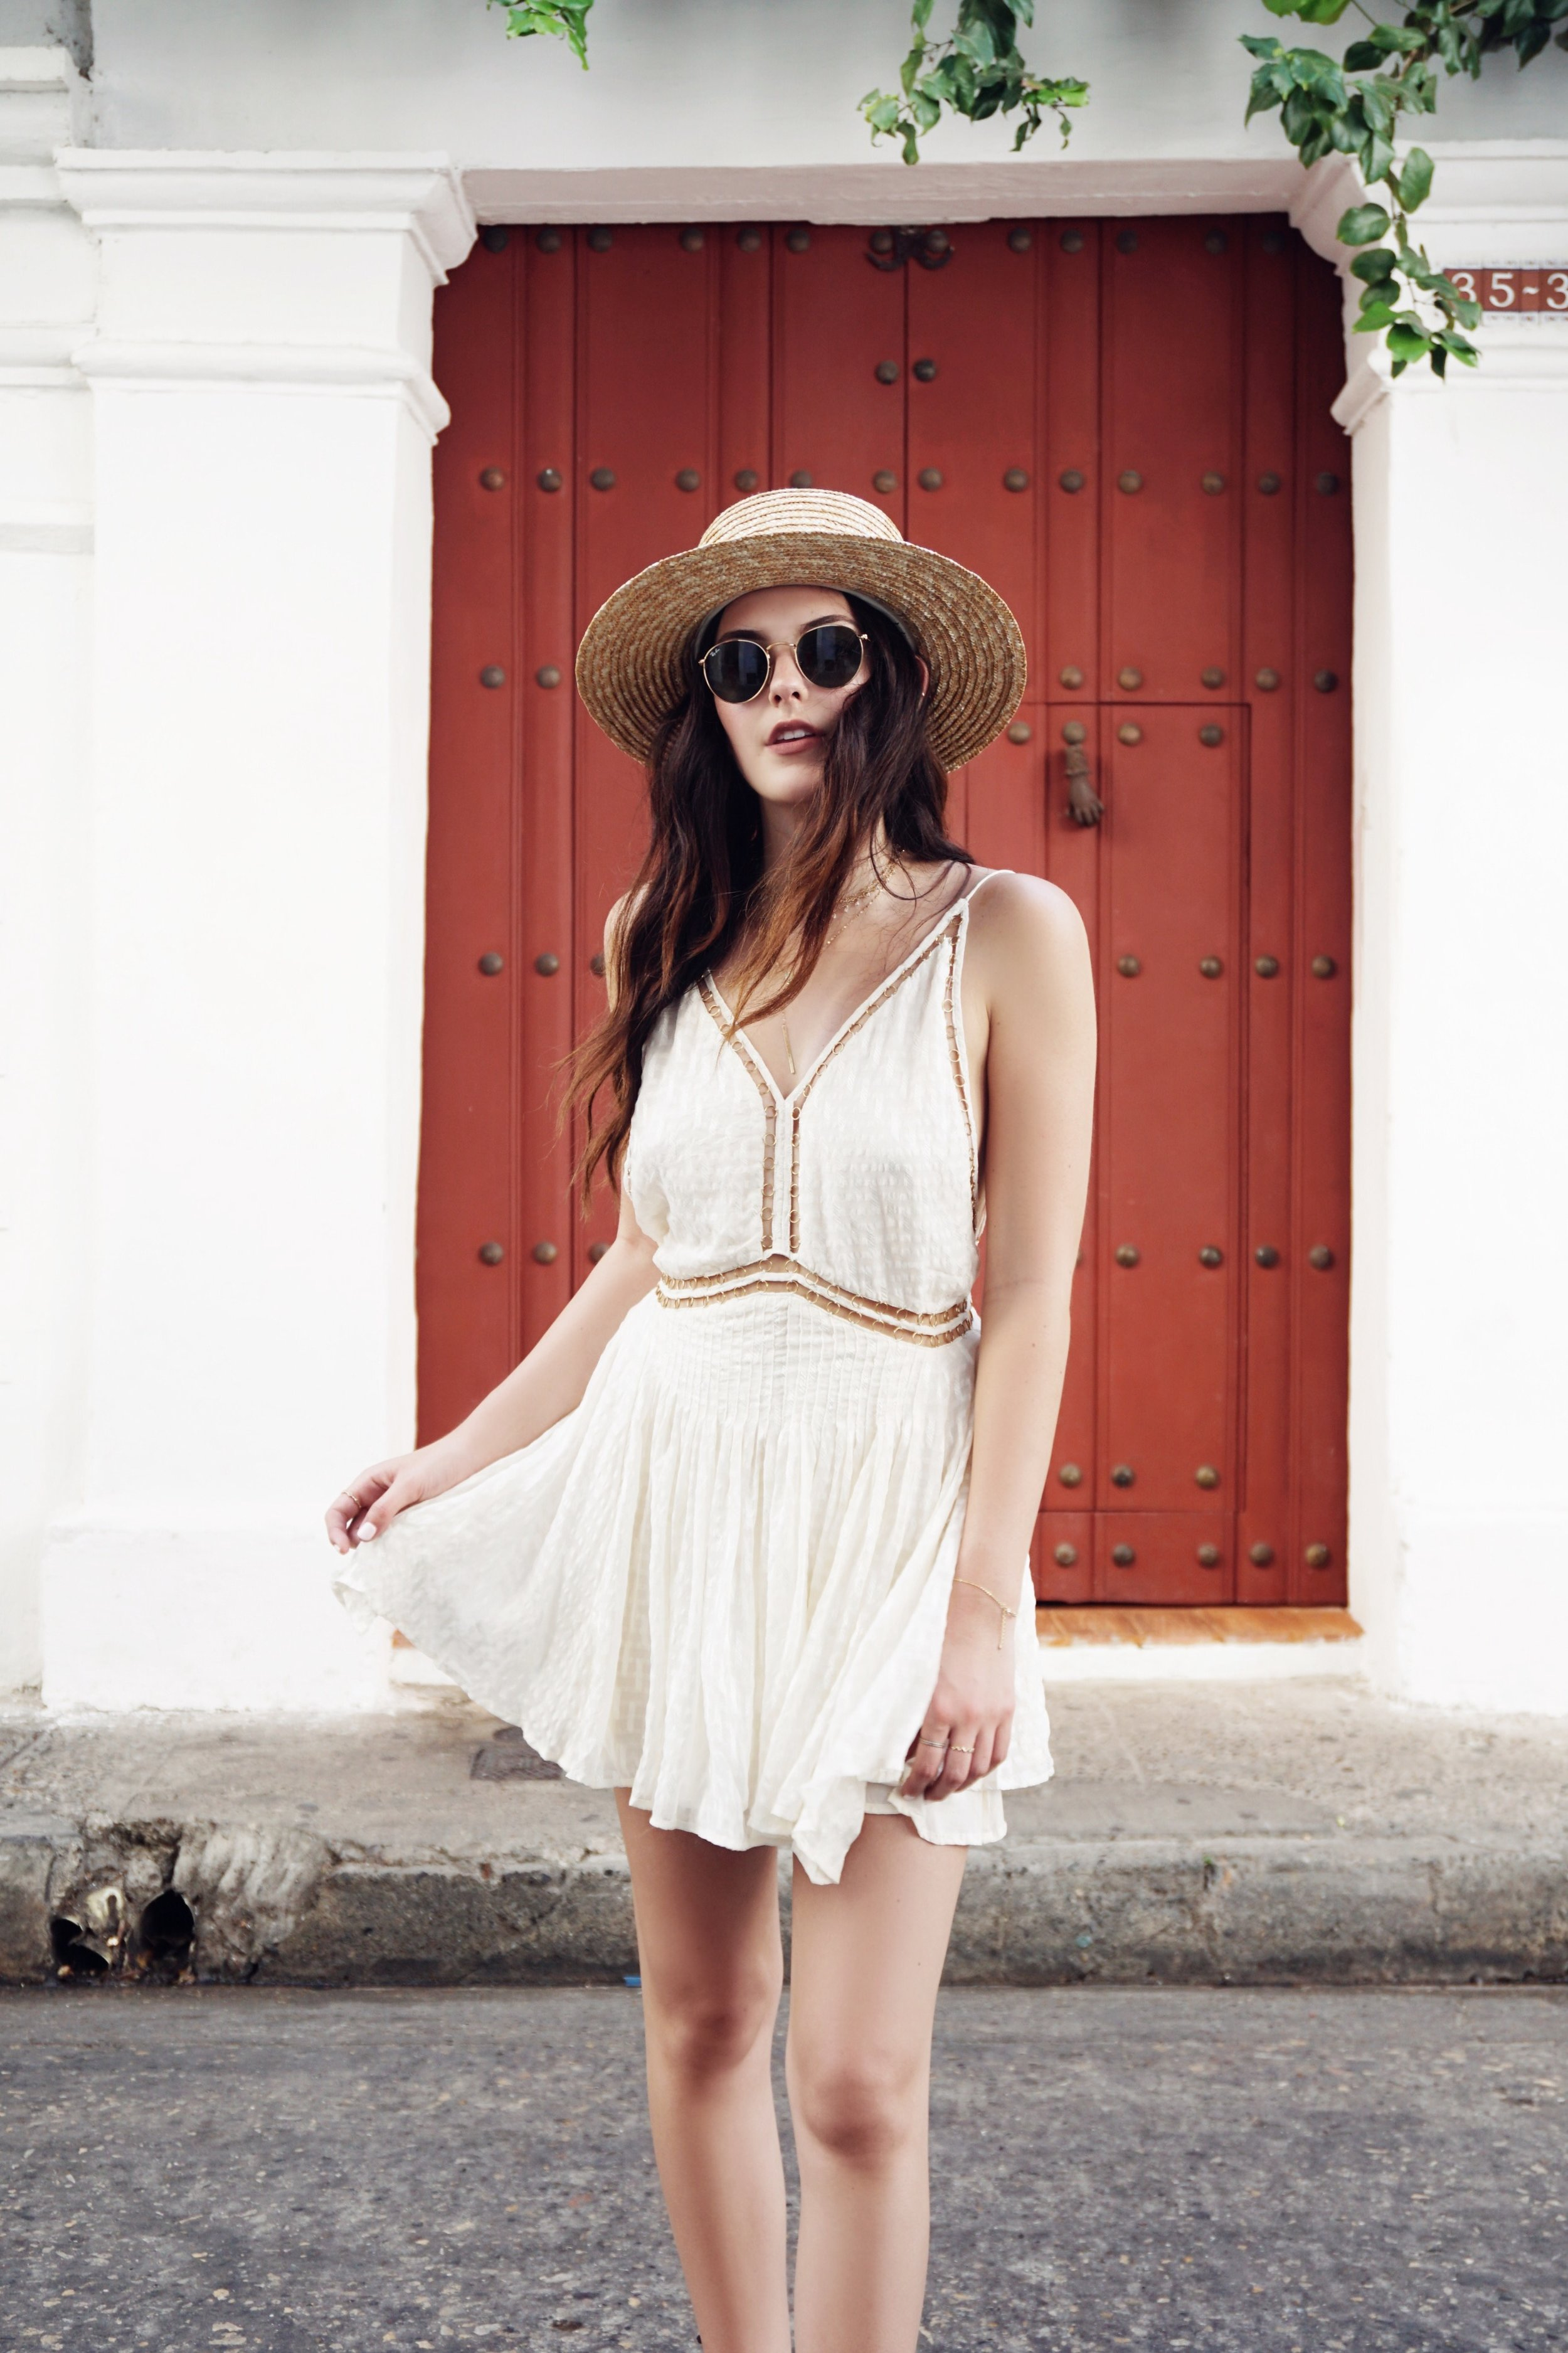 Julia Friedman's travel diary to Cartagena, Colombia wearing Magali Pascal.